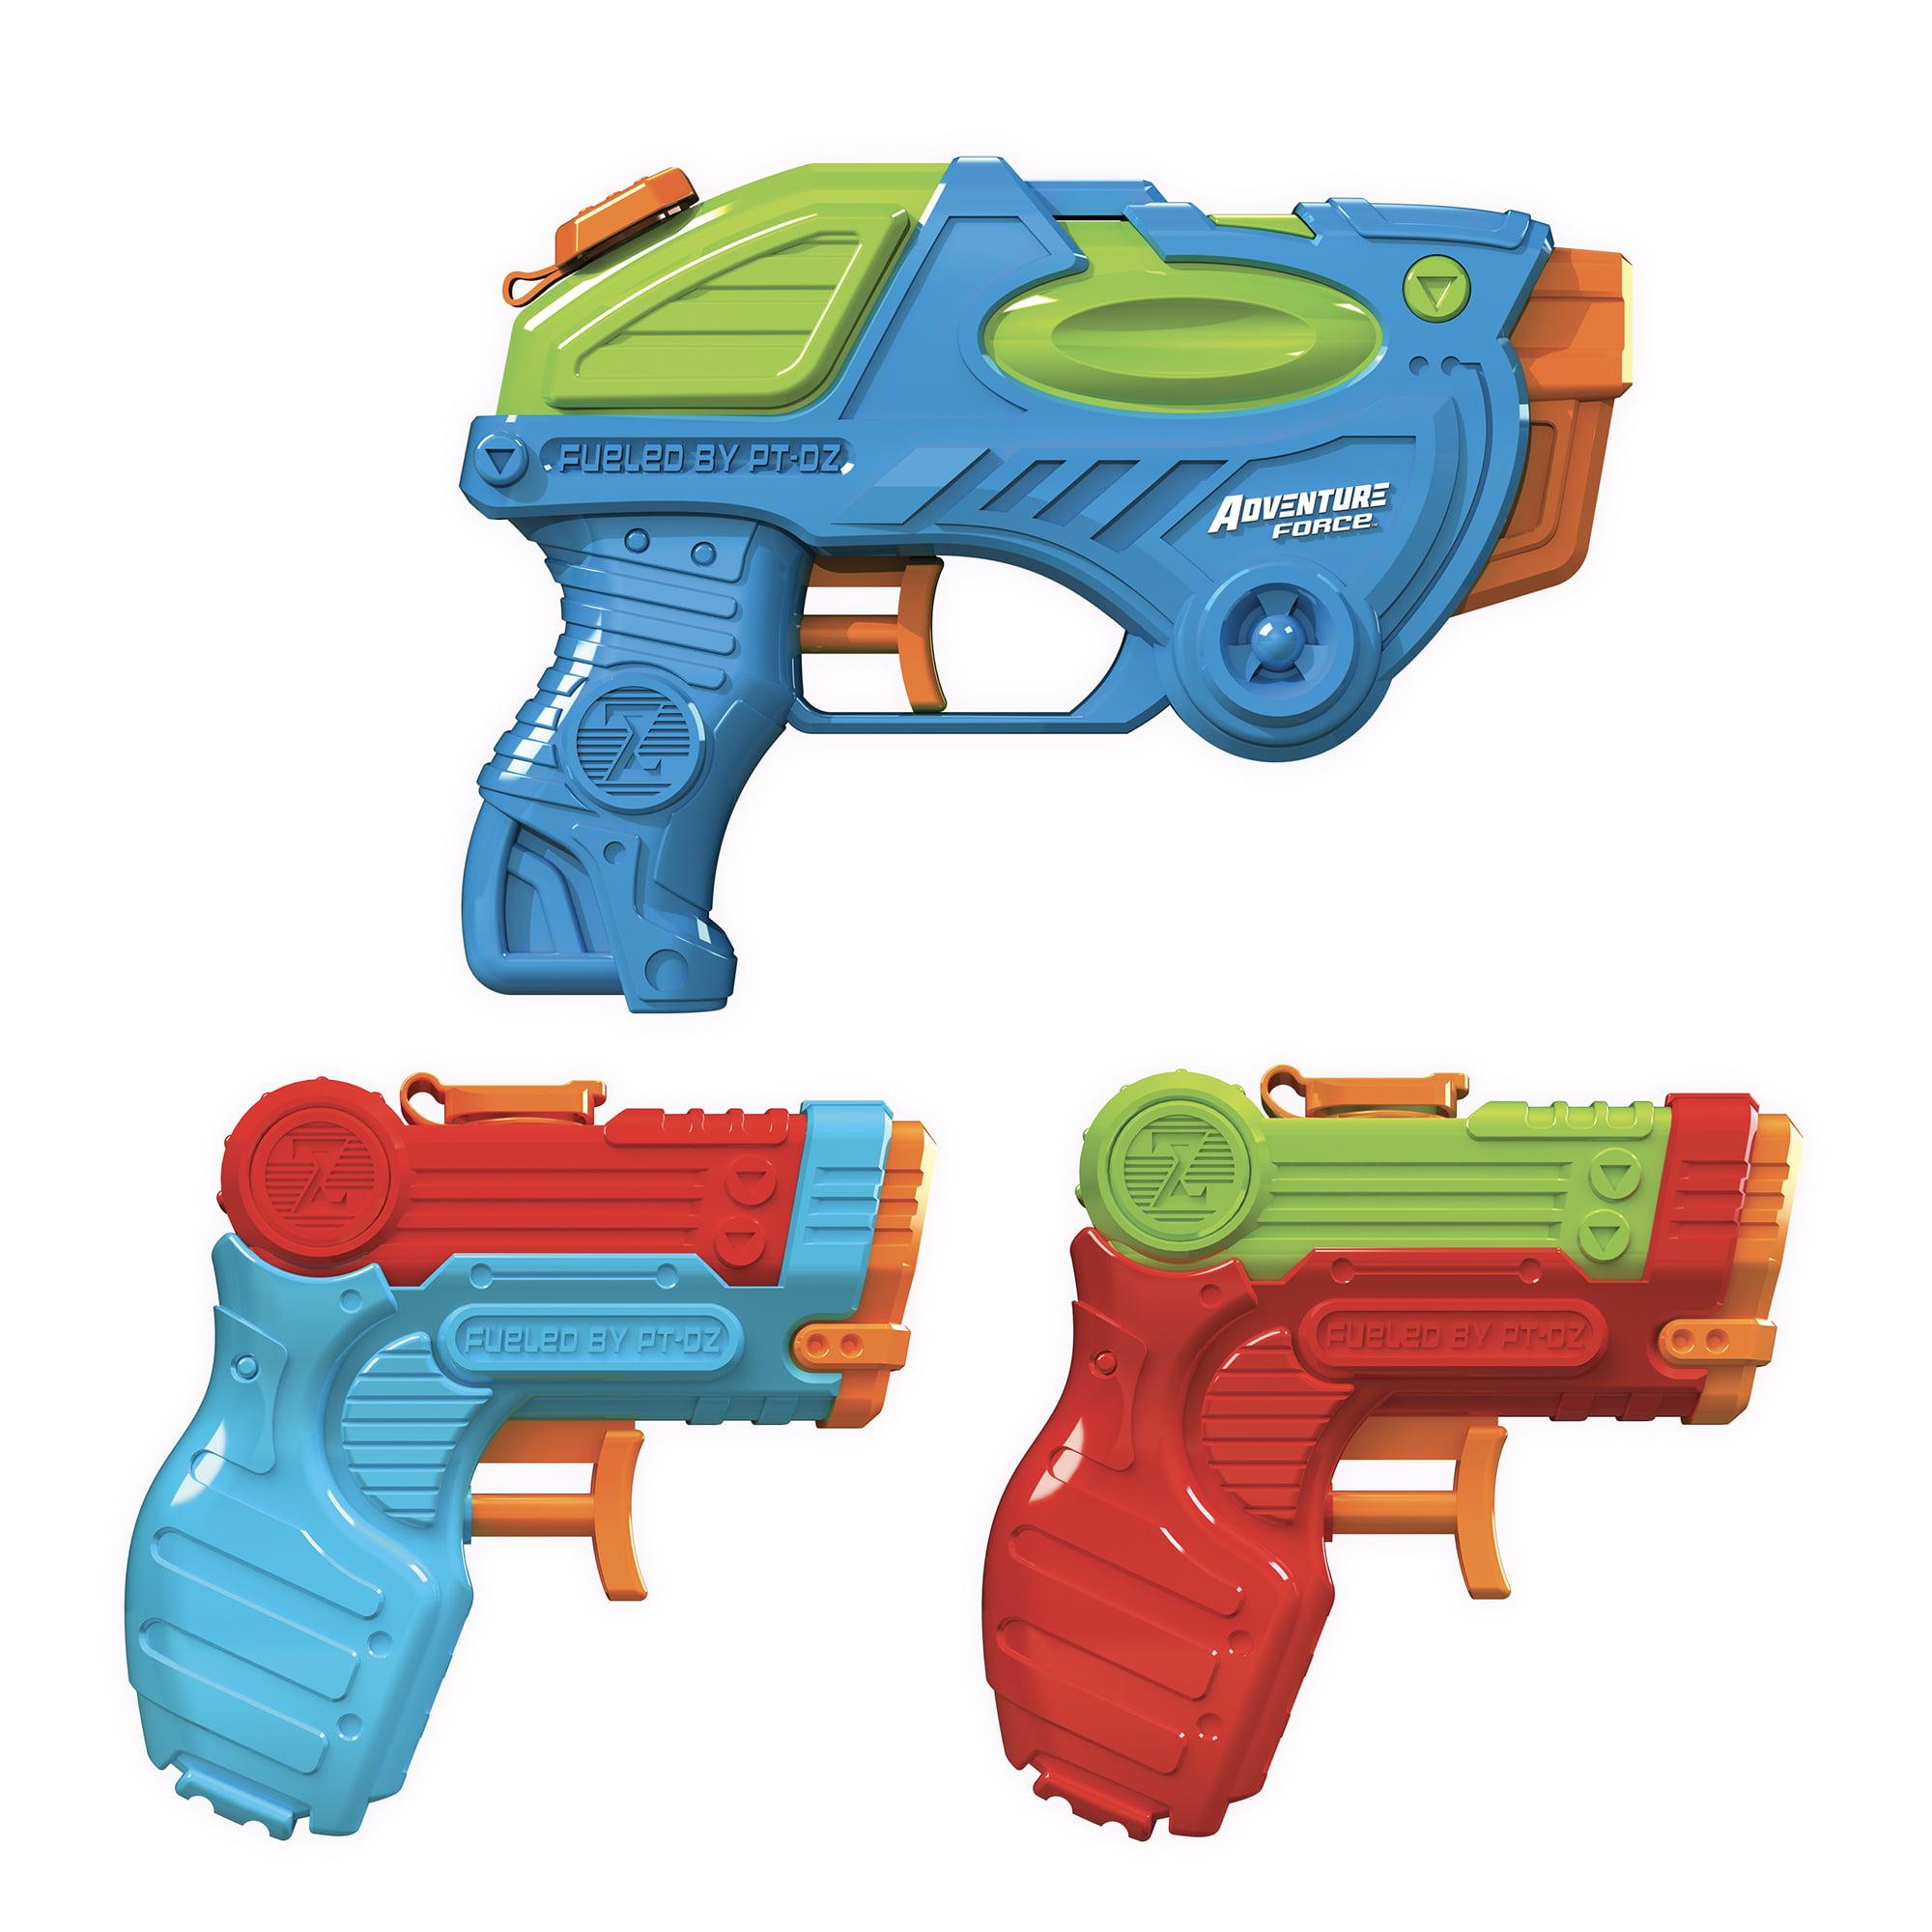 Pack of 3 Adventure Force Tidal Storm Water Guns